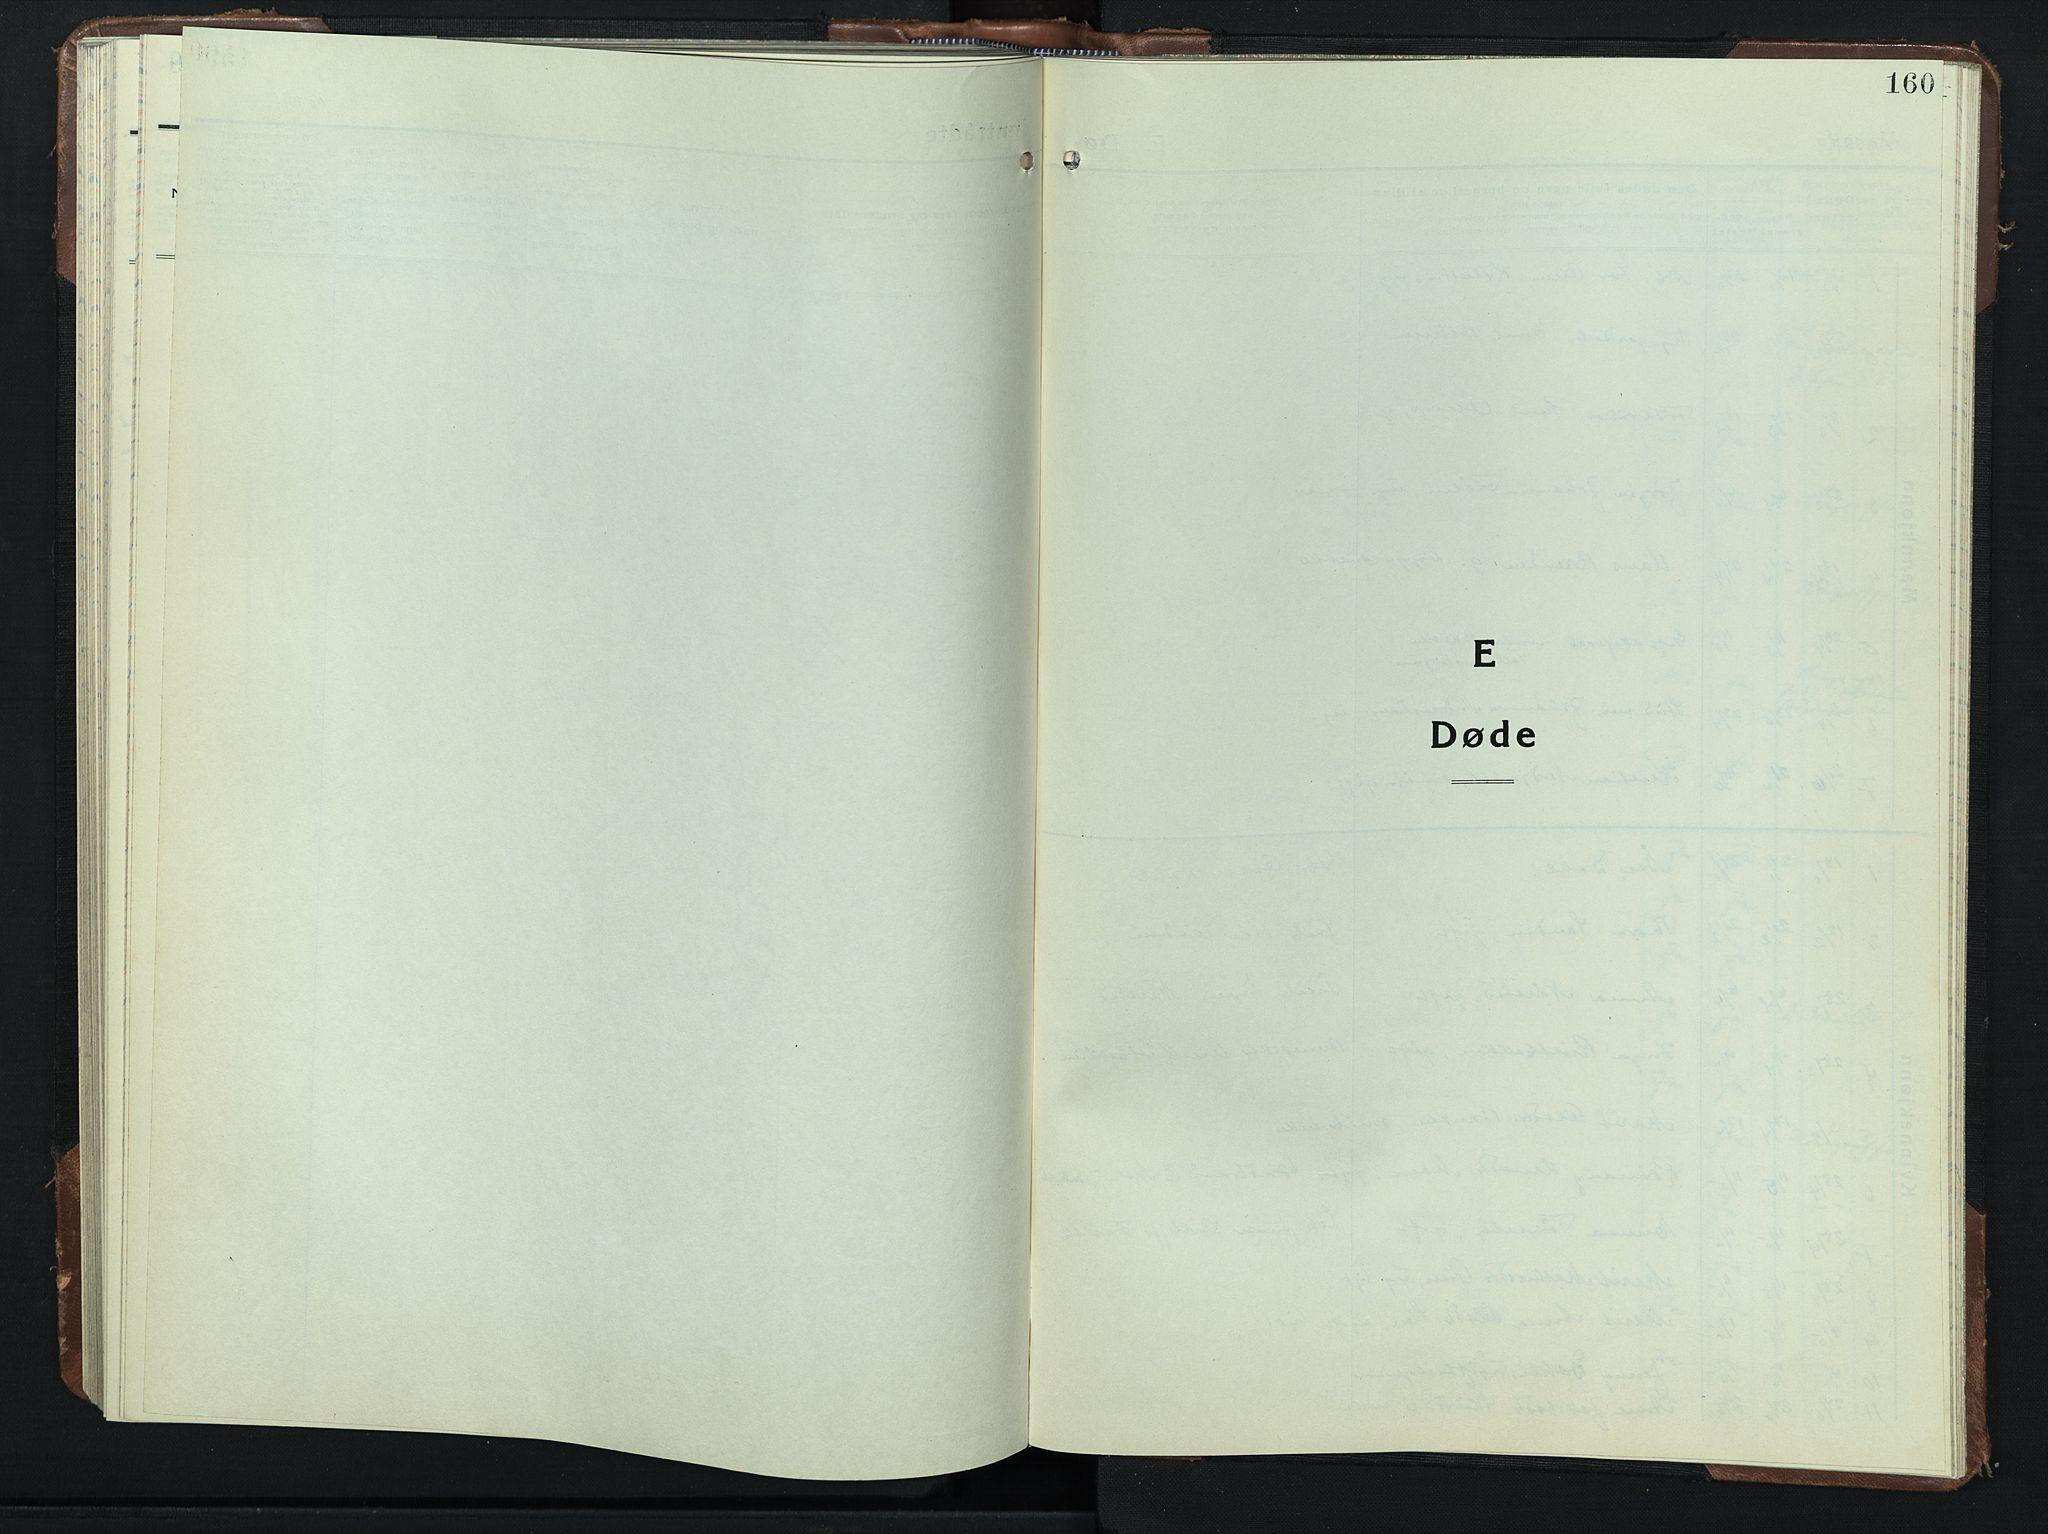 SAH, Sel prestekontor, Klokkerbok nr. 3, 1940-1951, s. 160